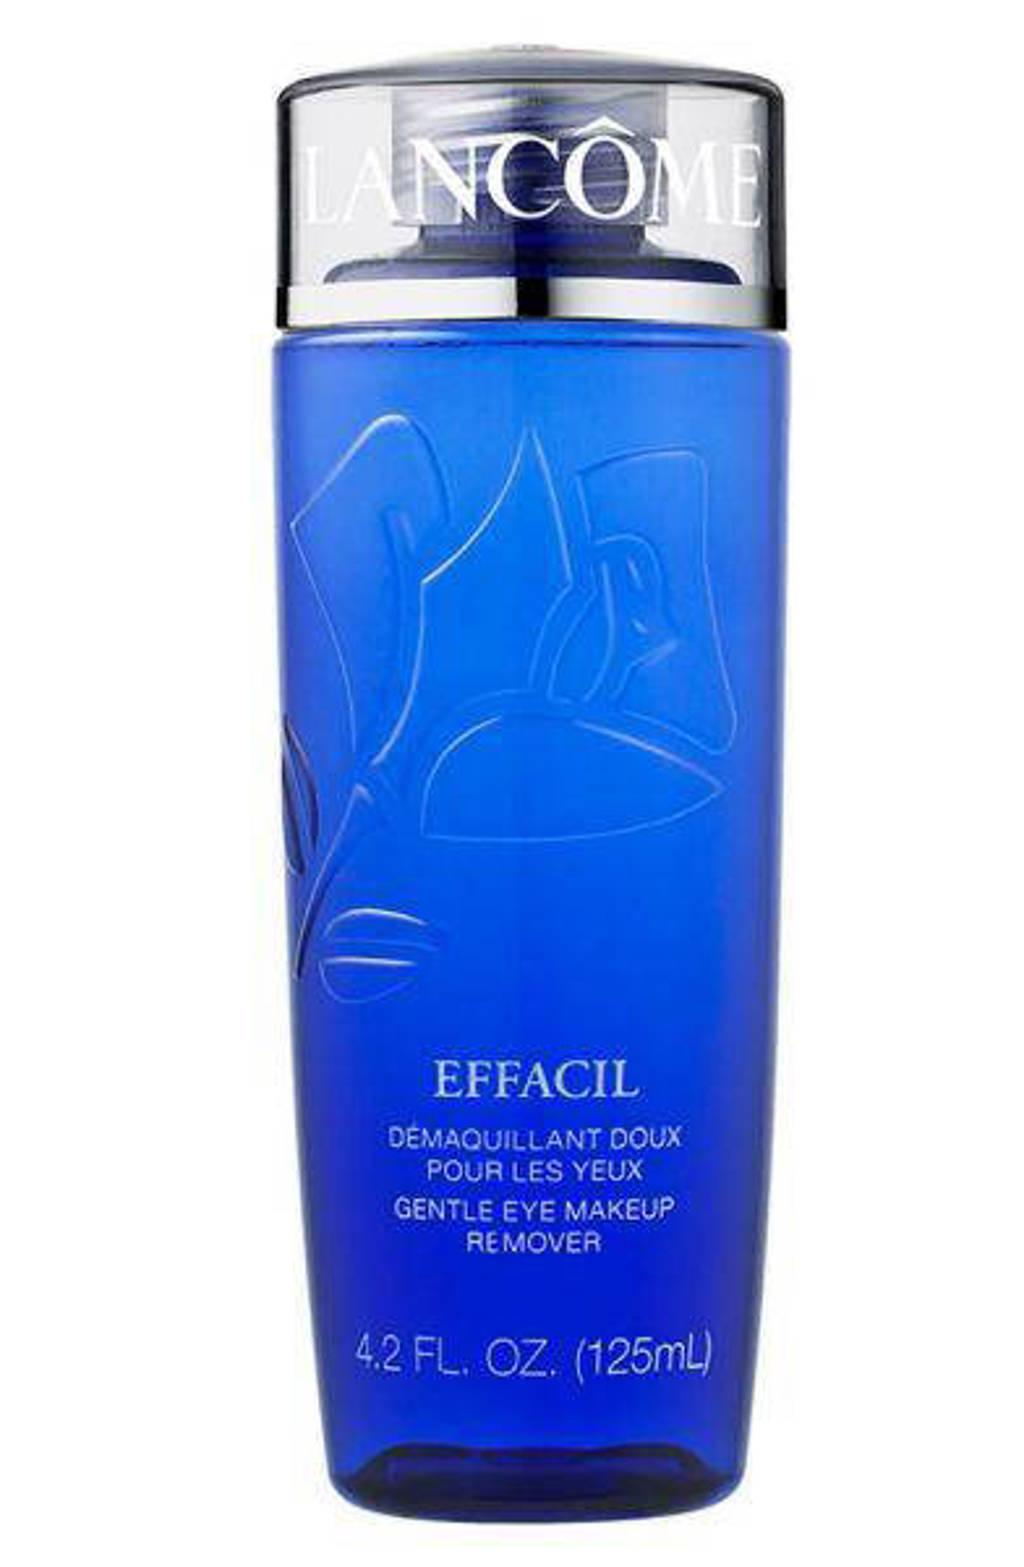 Lancôme Effacil oogmake-up remover - 125 ml